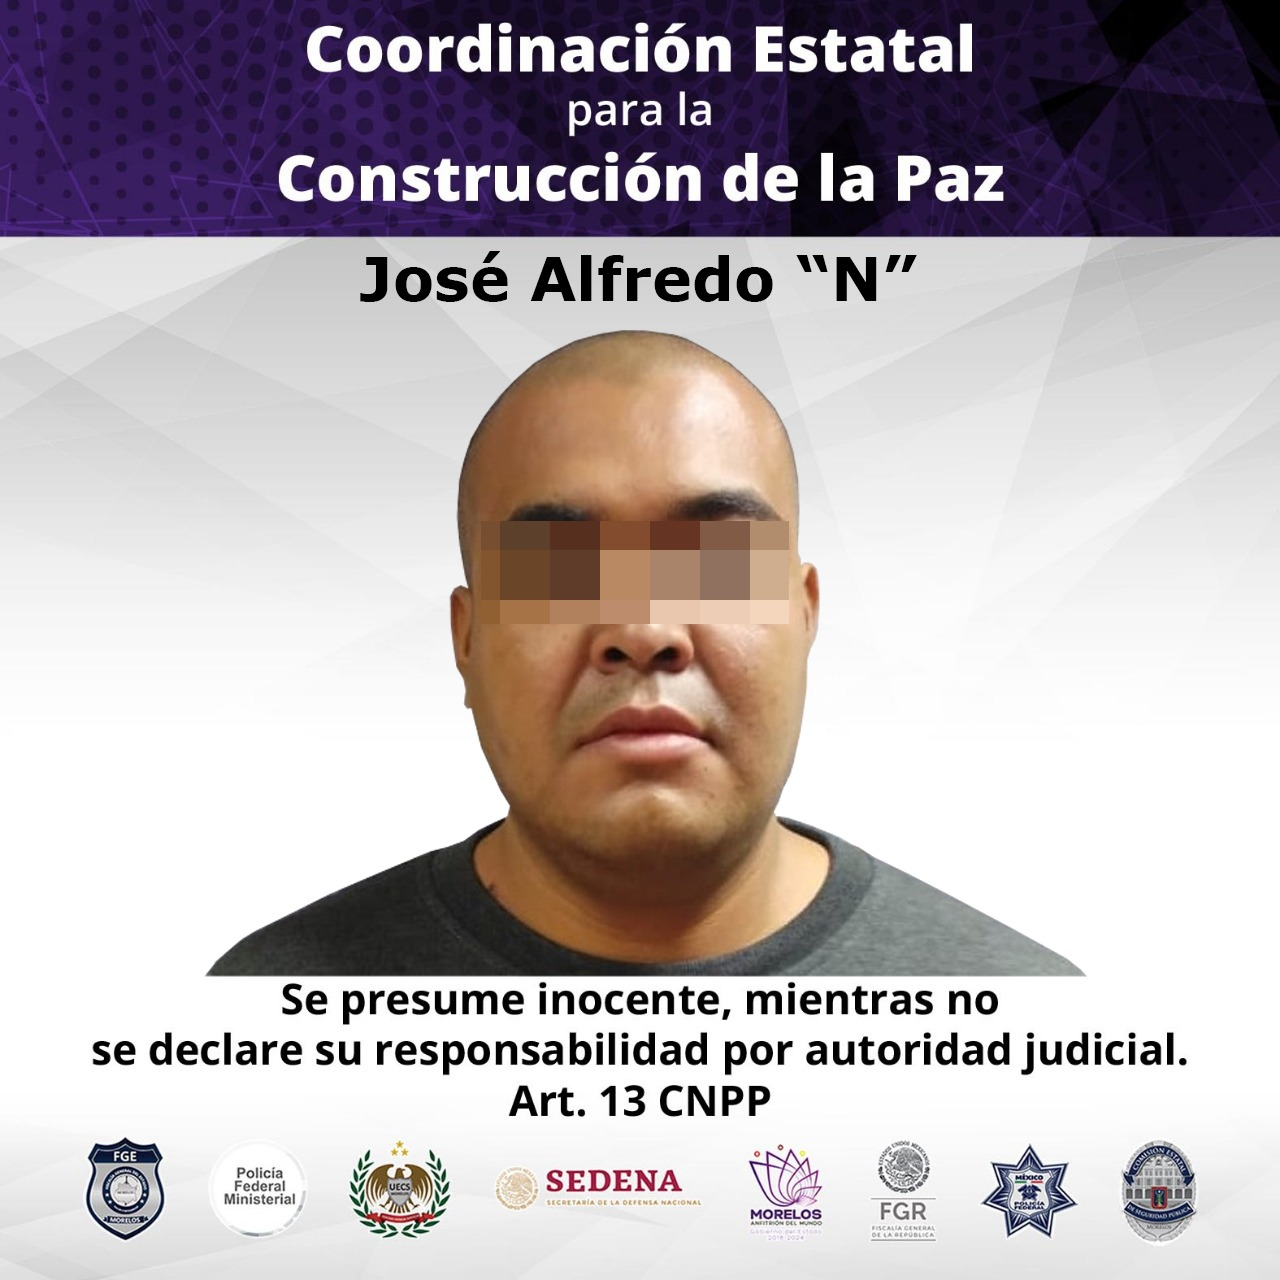 JOSÉ ALFREDO N